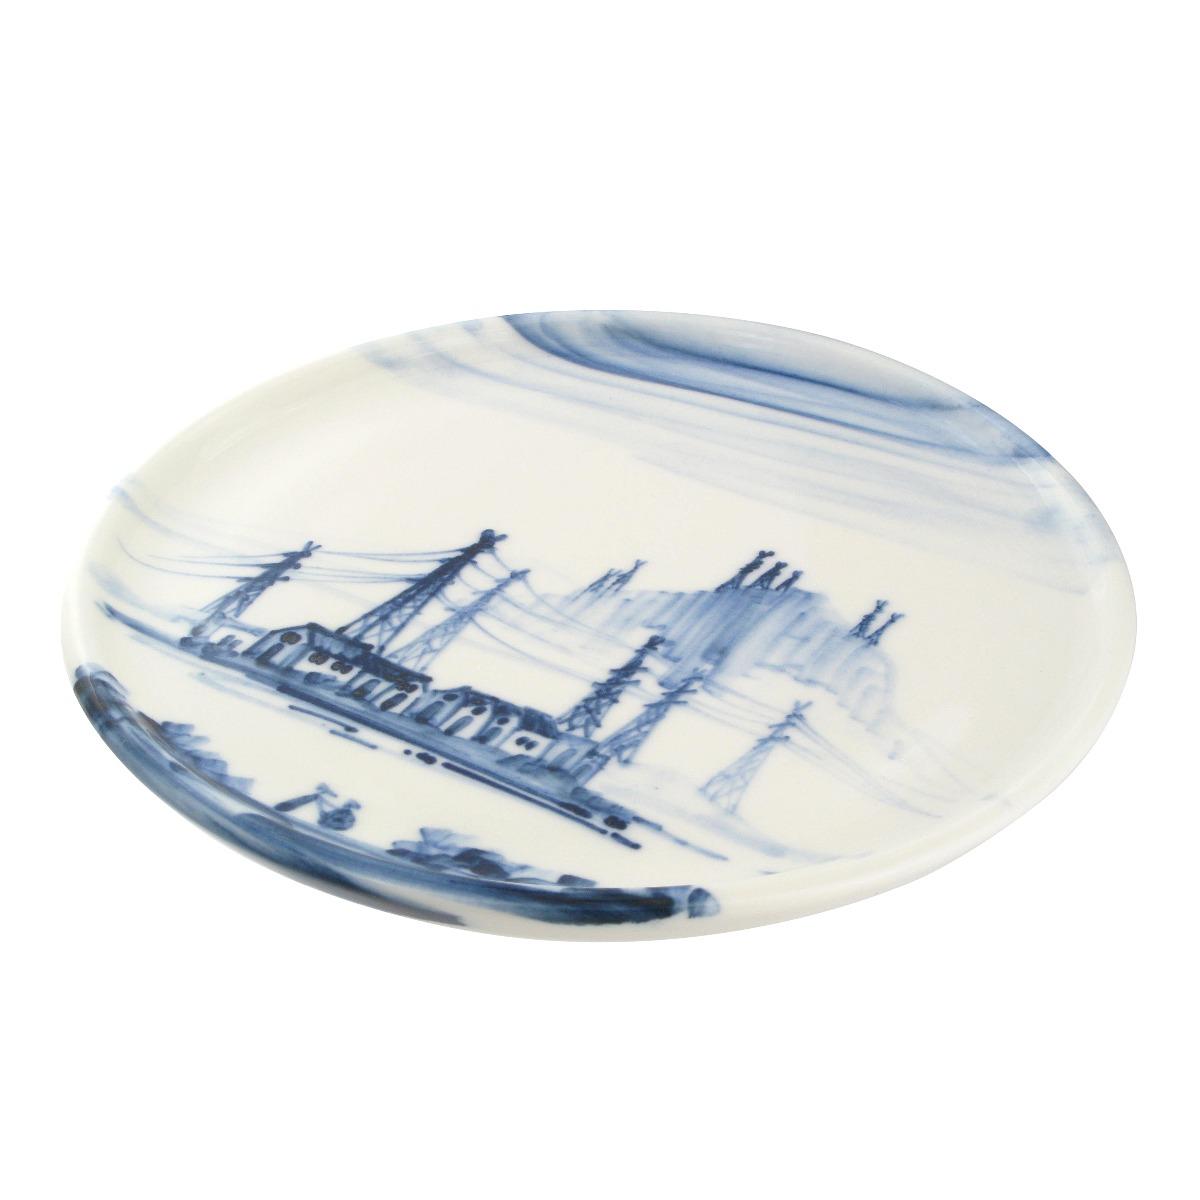 Phantom landscape plate